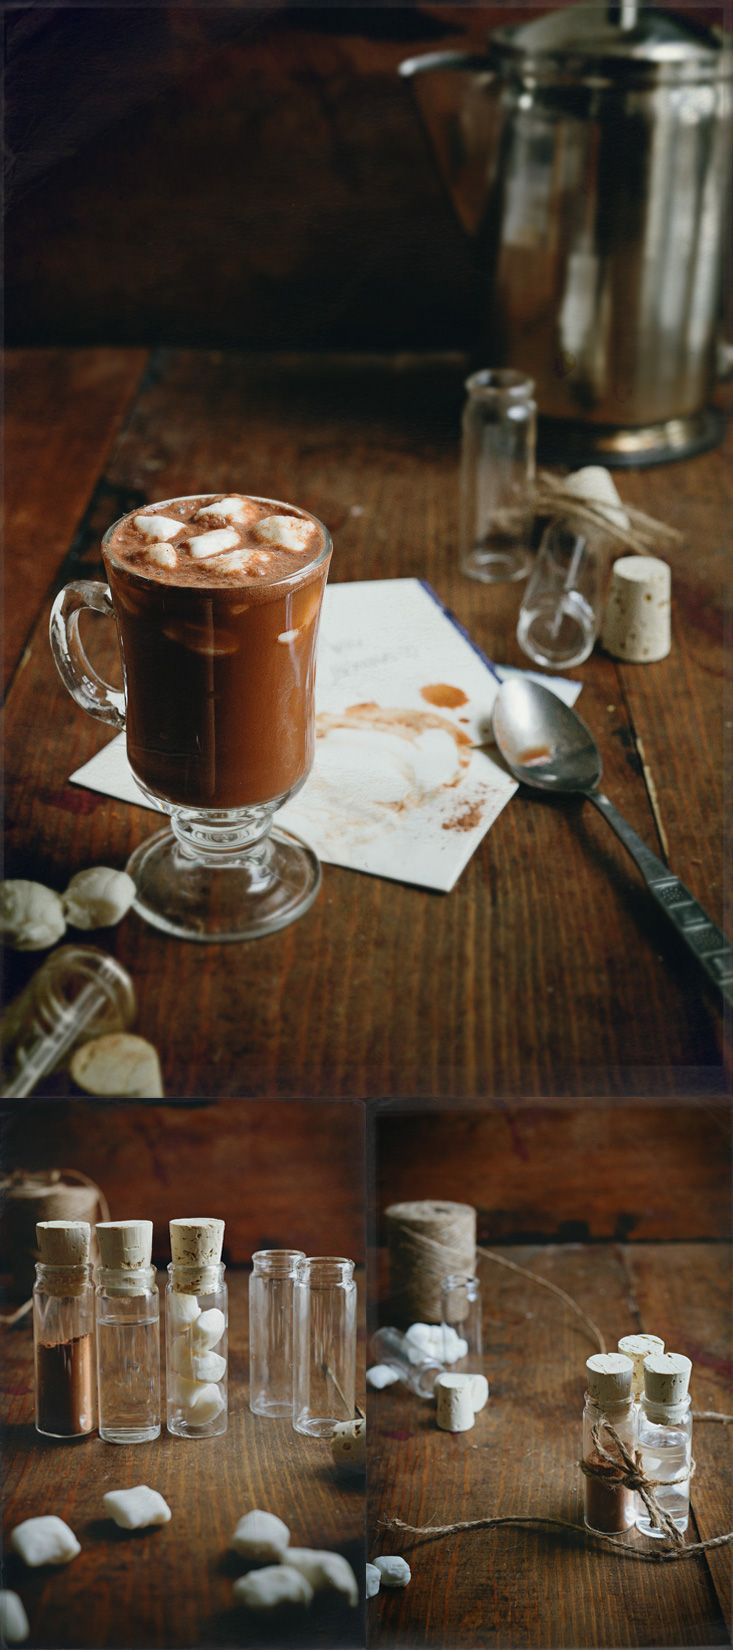 Best 20+ Spiked hot chocolate ideas on Pinterest | Chocolate bar ...